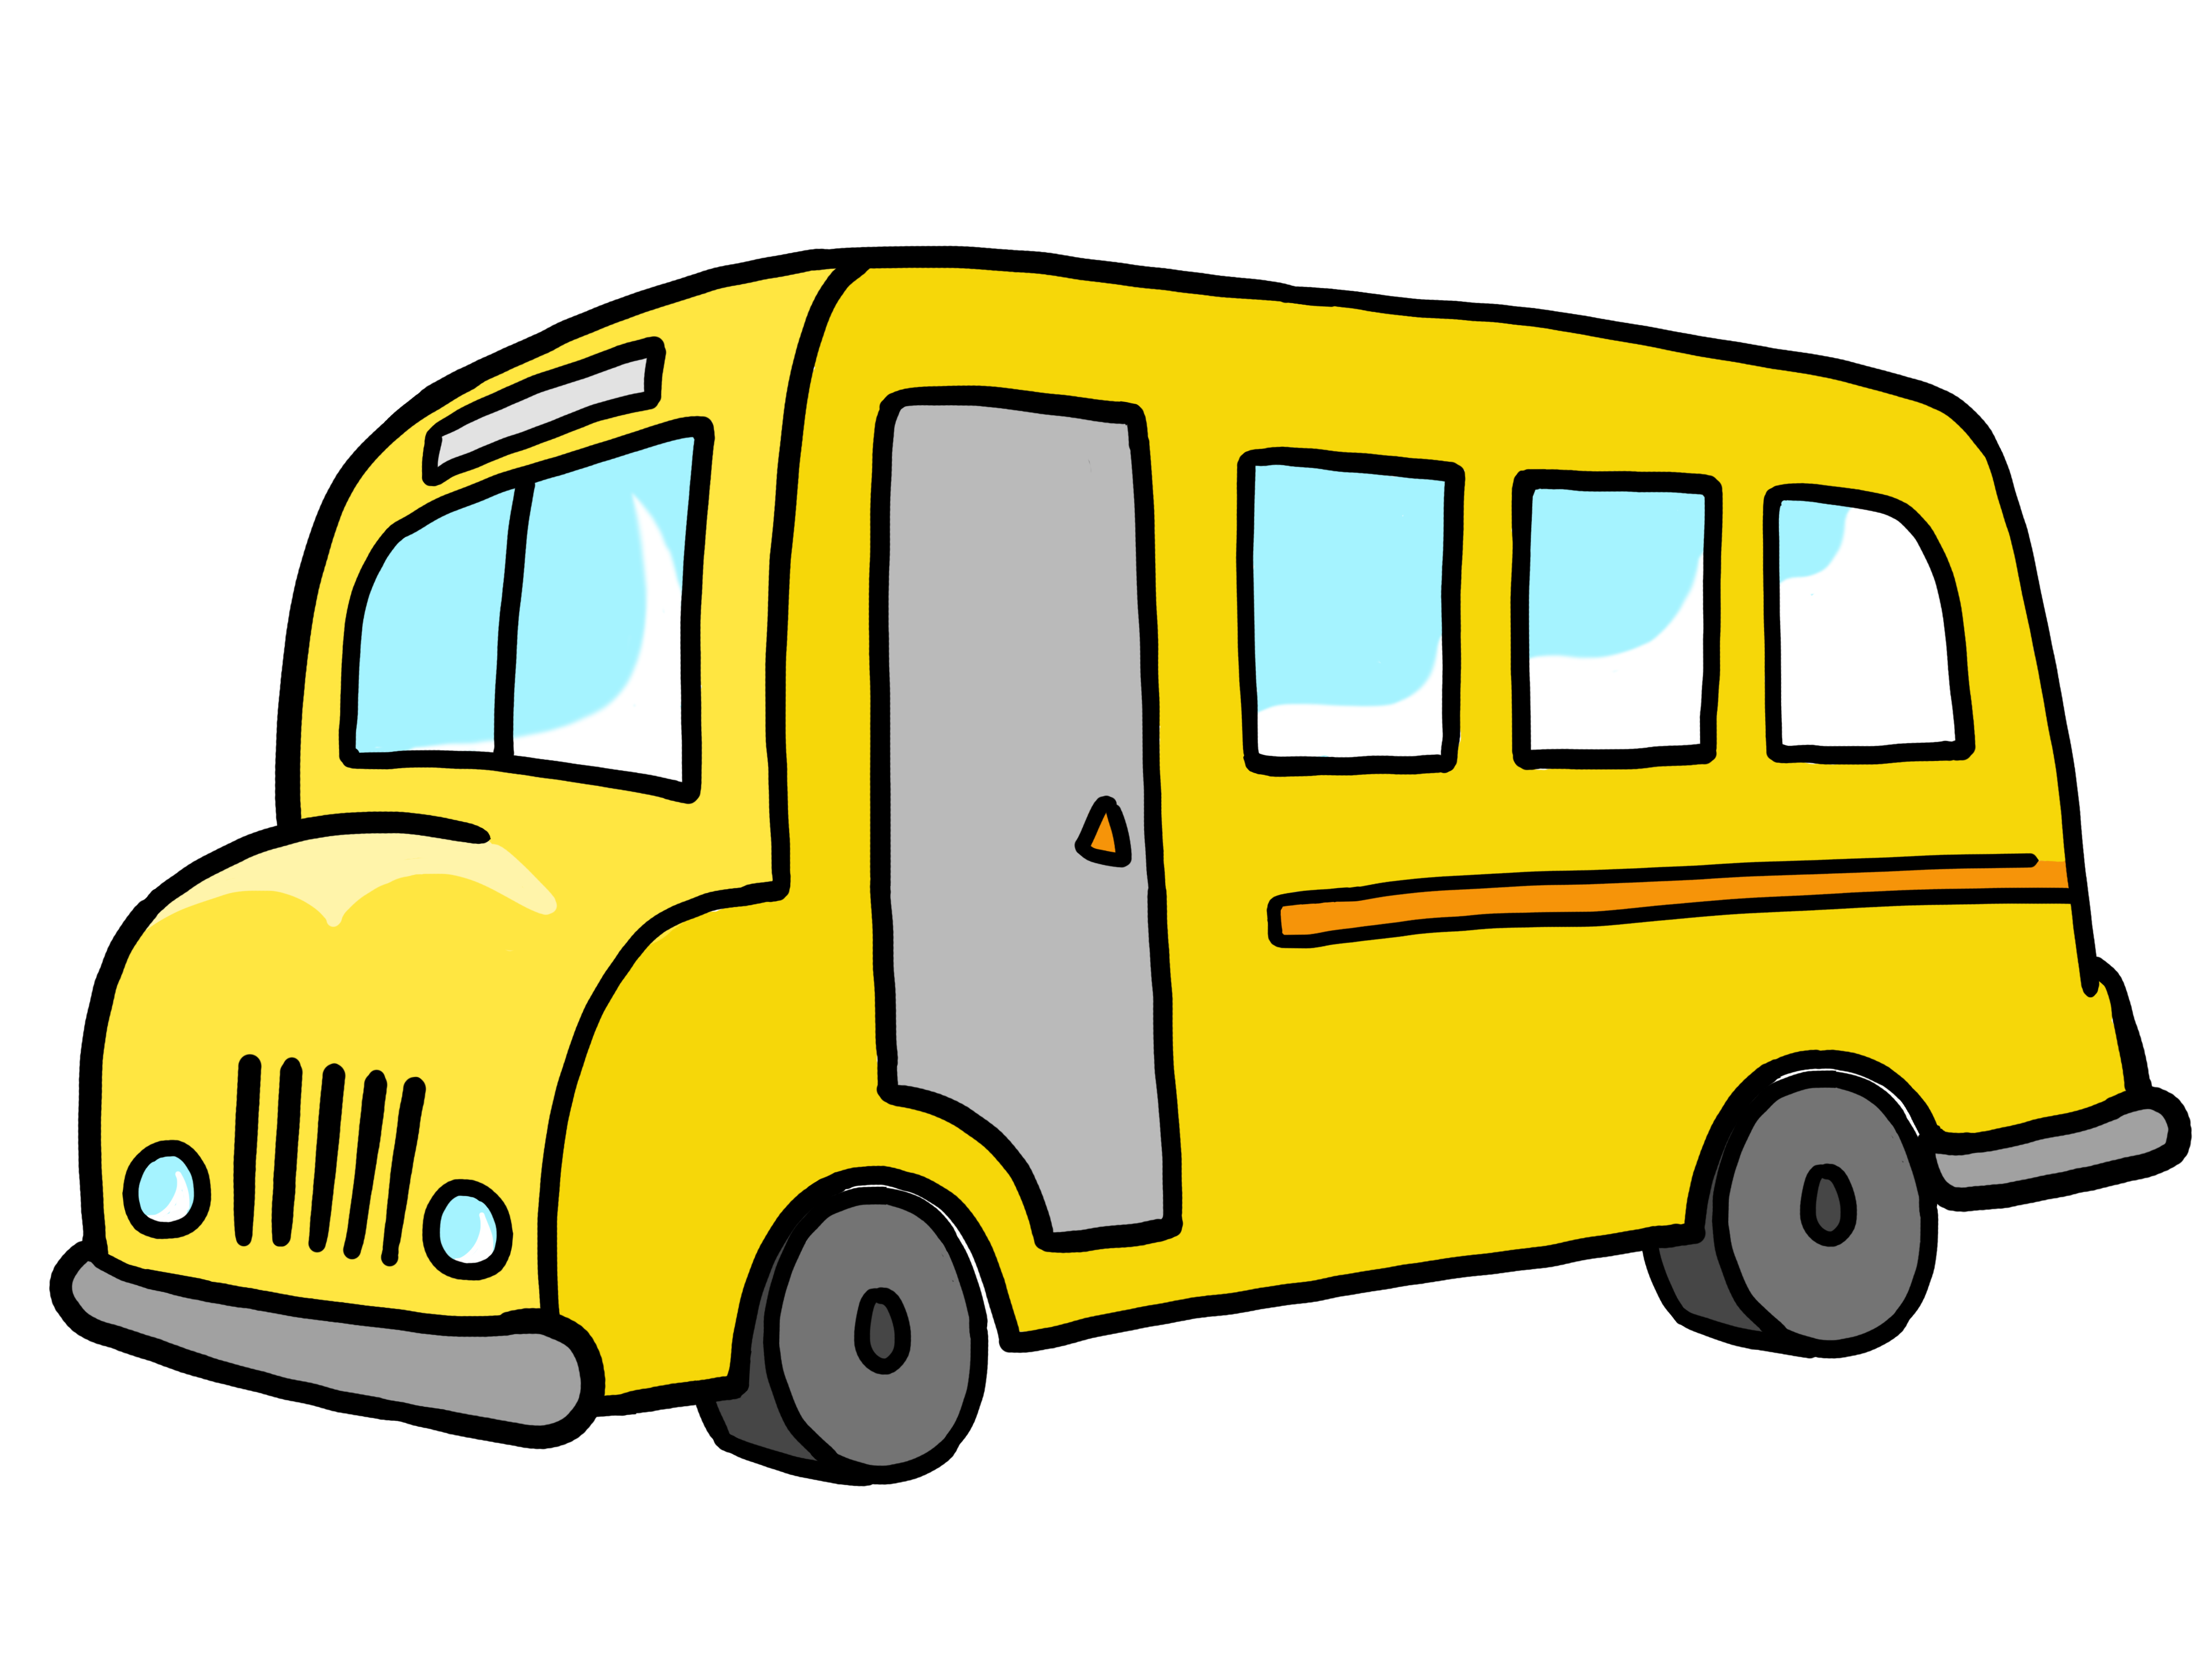 Disney bound- charter bus clipart